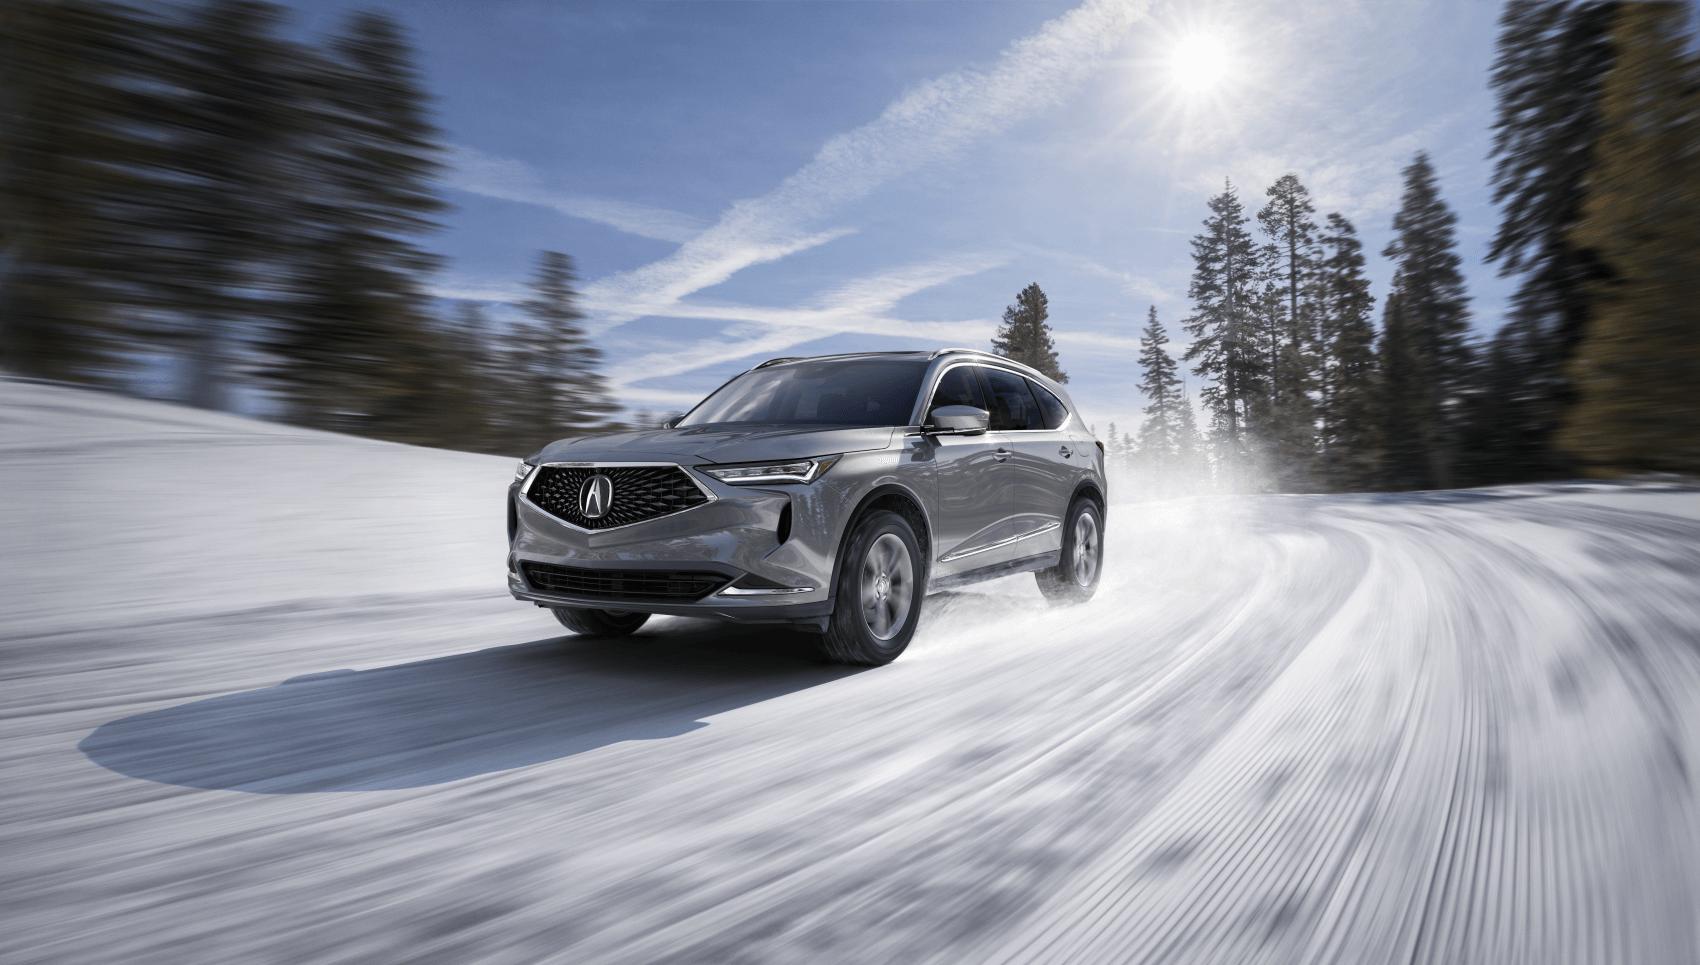 Acura MDX Base Lunar Silver Metallic Snow Winter Sussman Acura